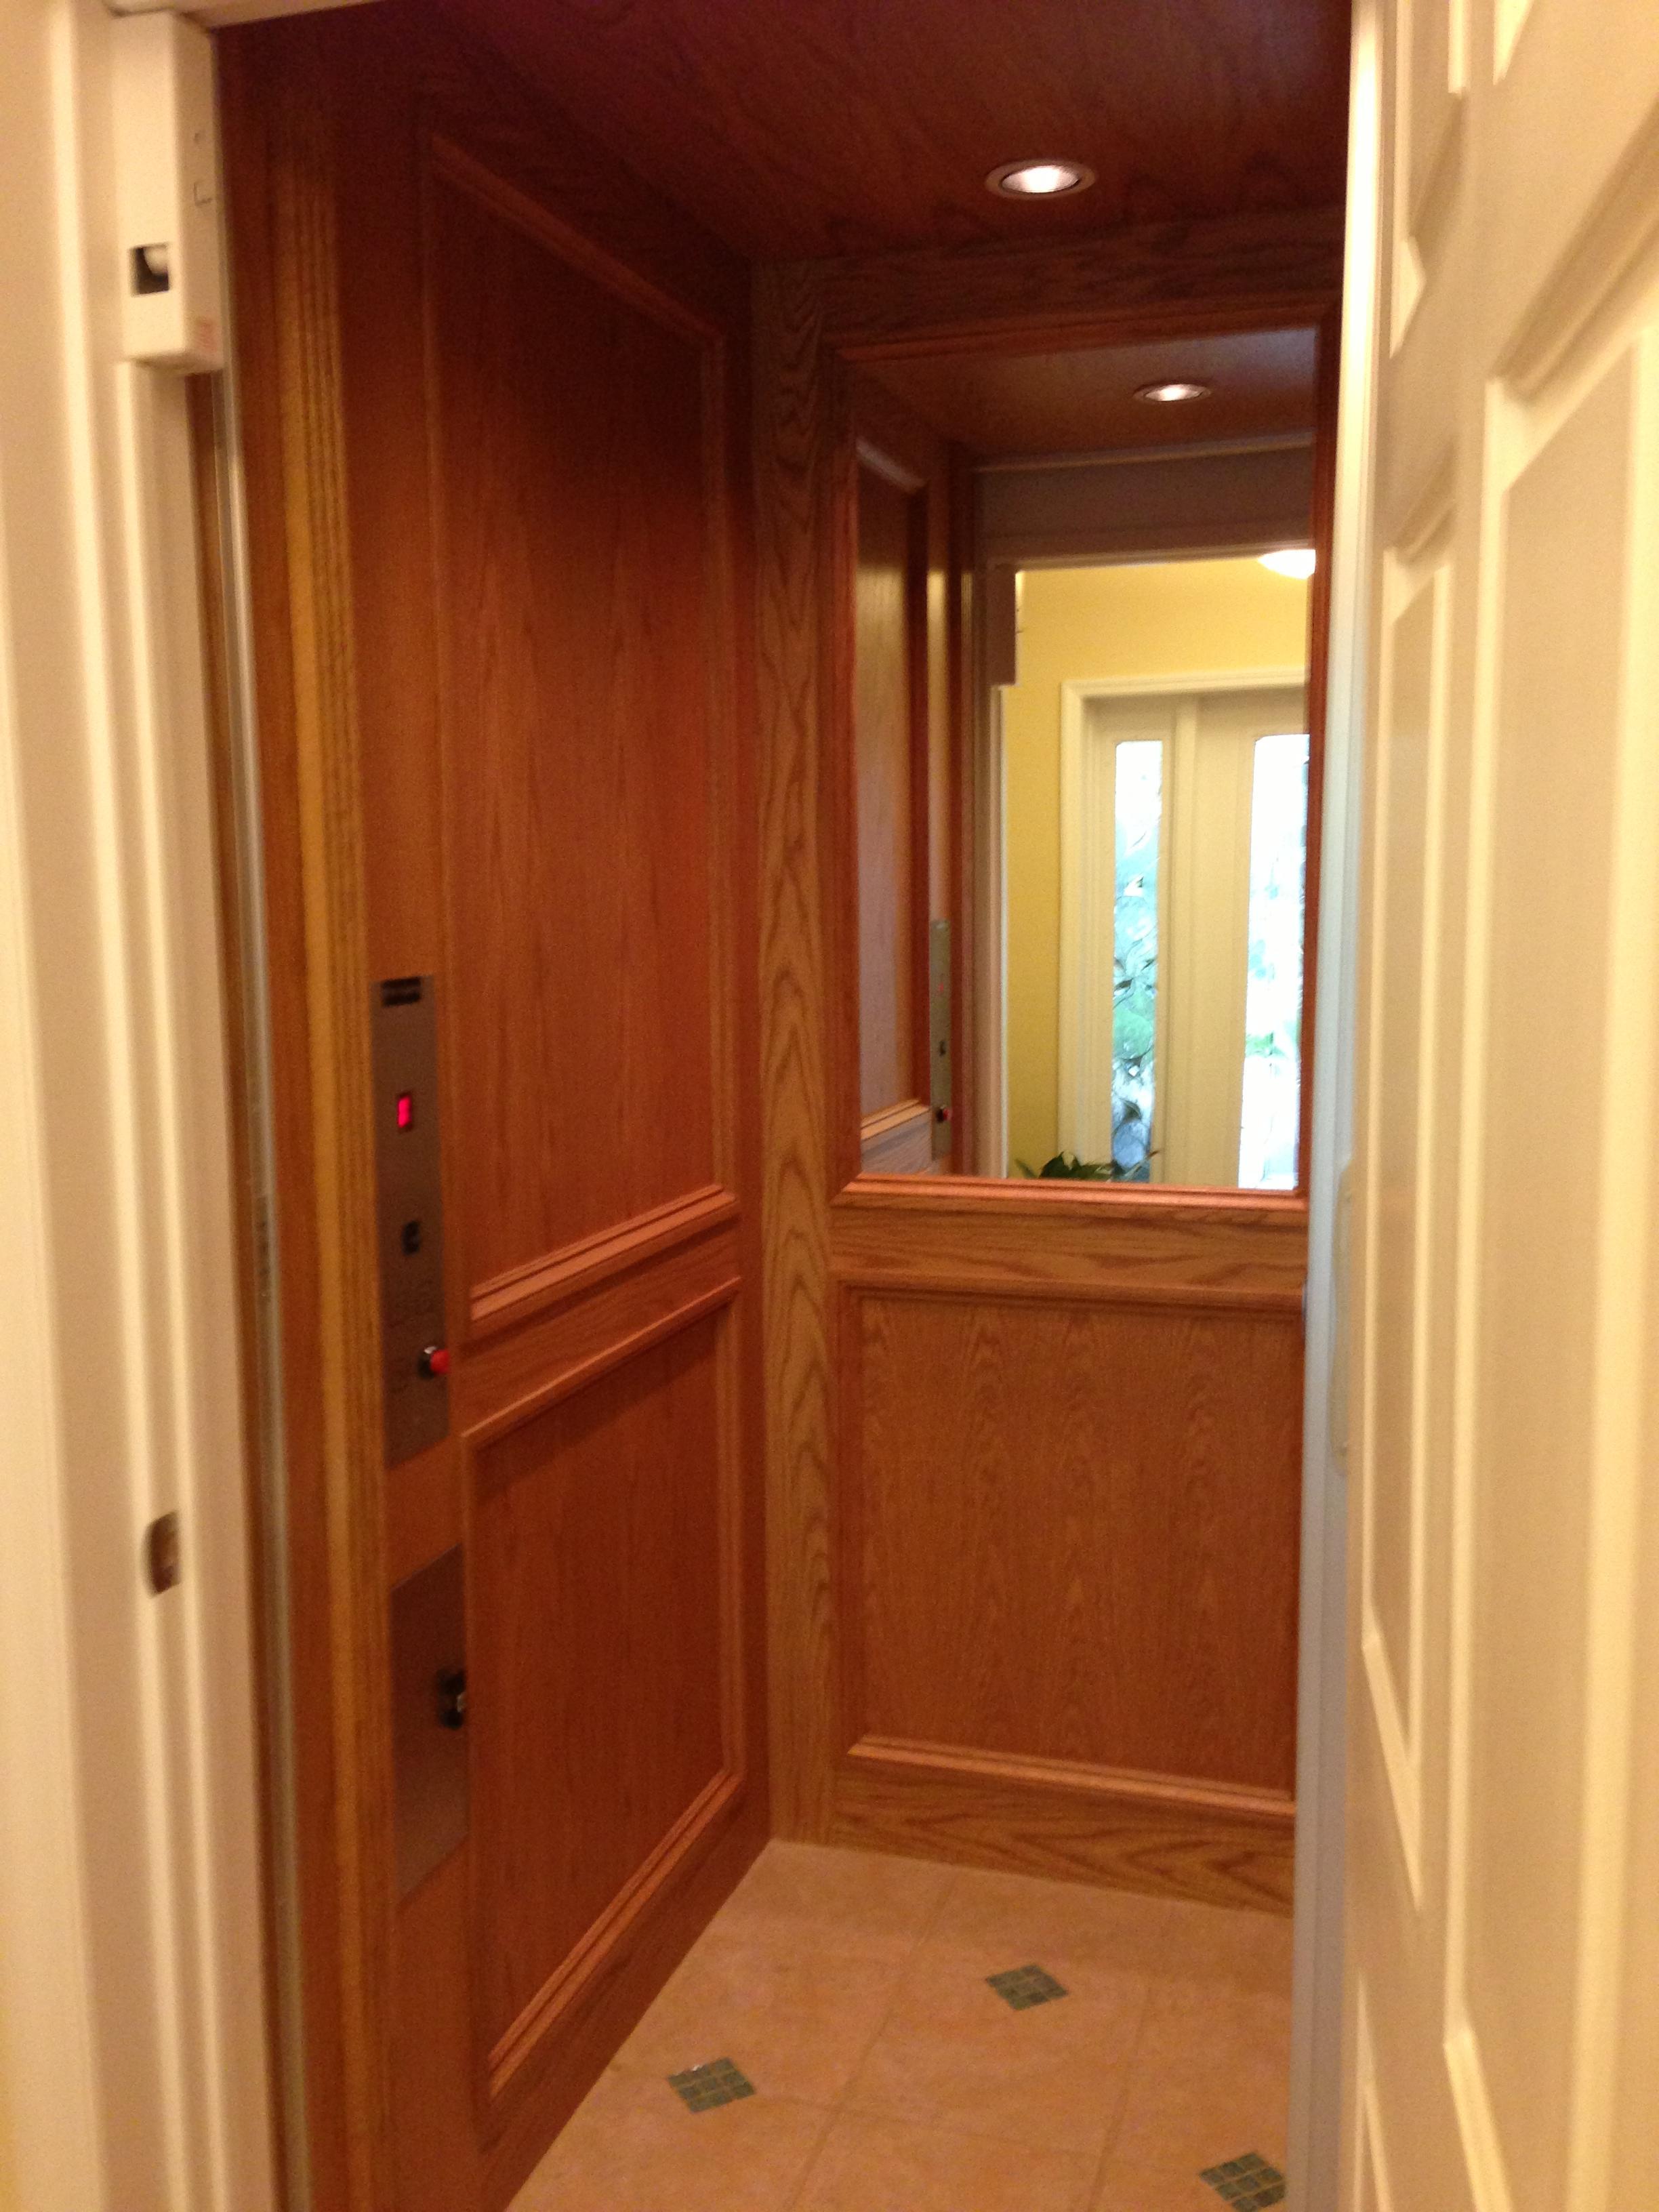 Islamorada Elevator Co. image 0